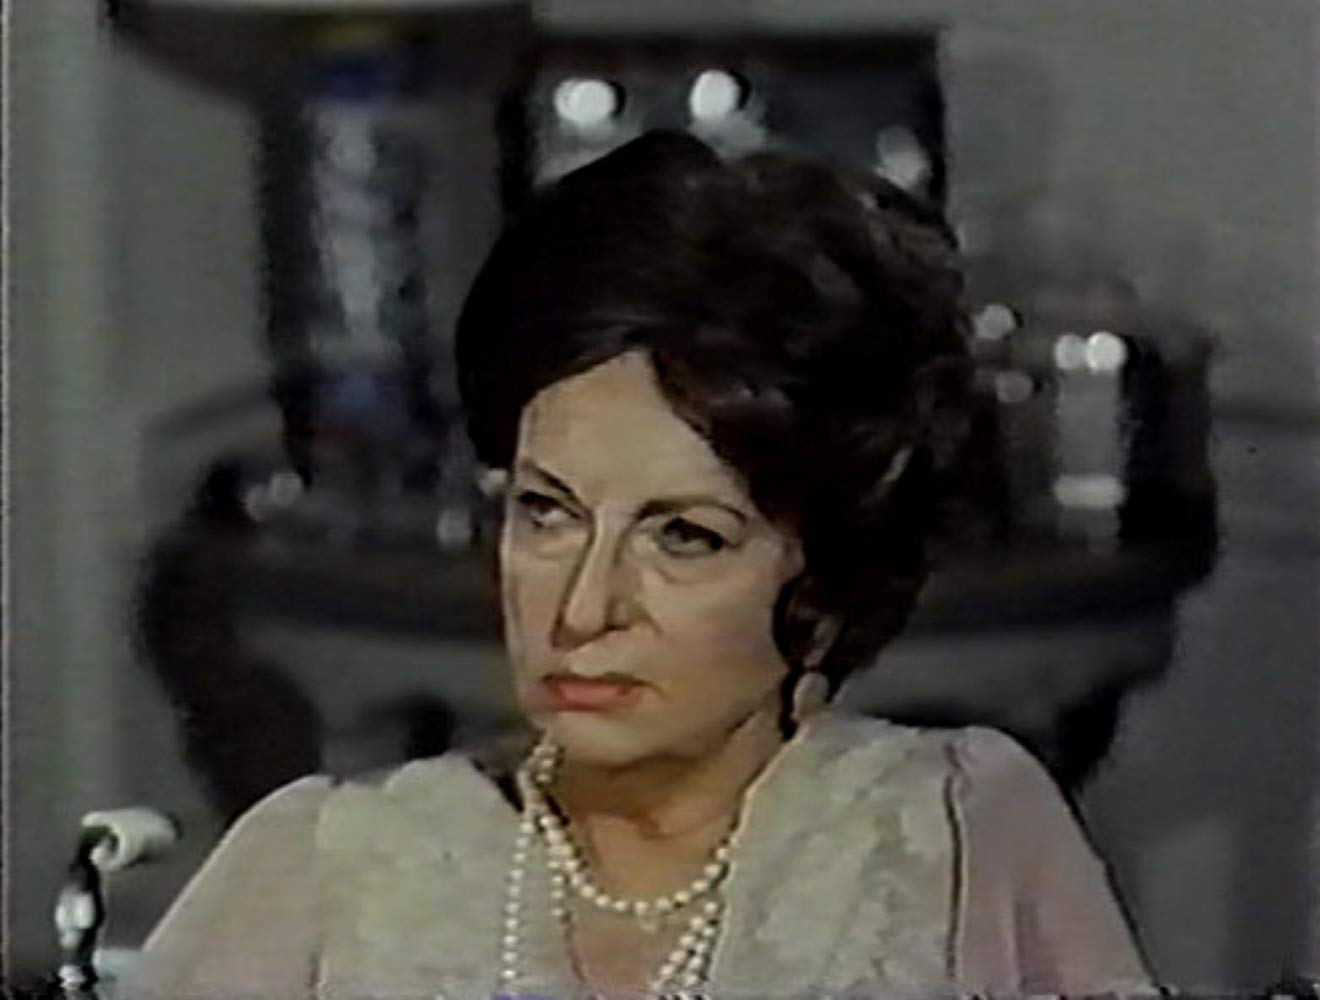 Agnes Moorehead in Dear Dead Delilah (1972)